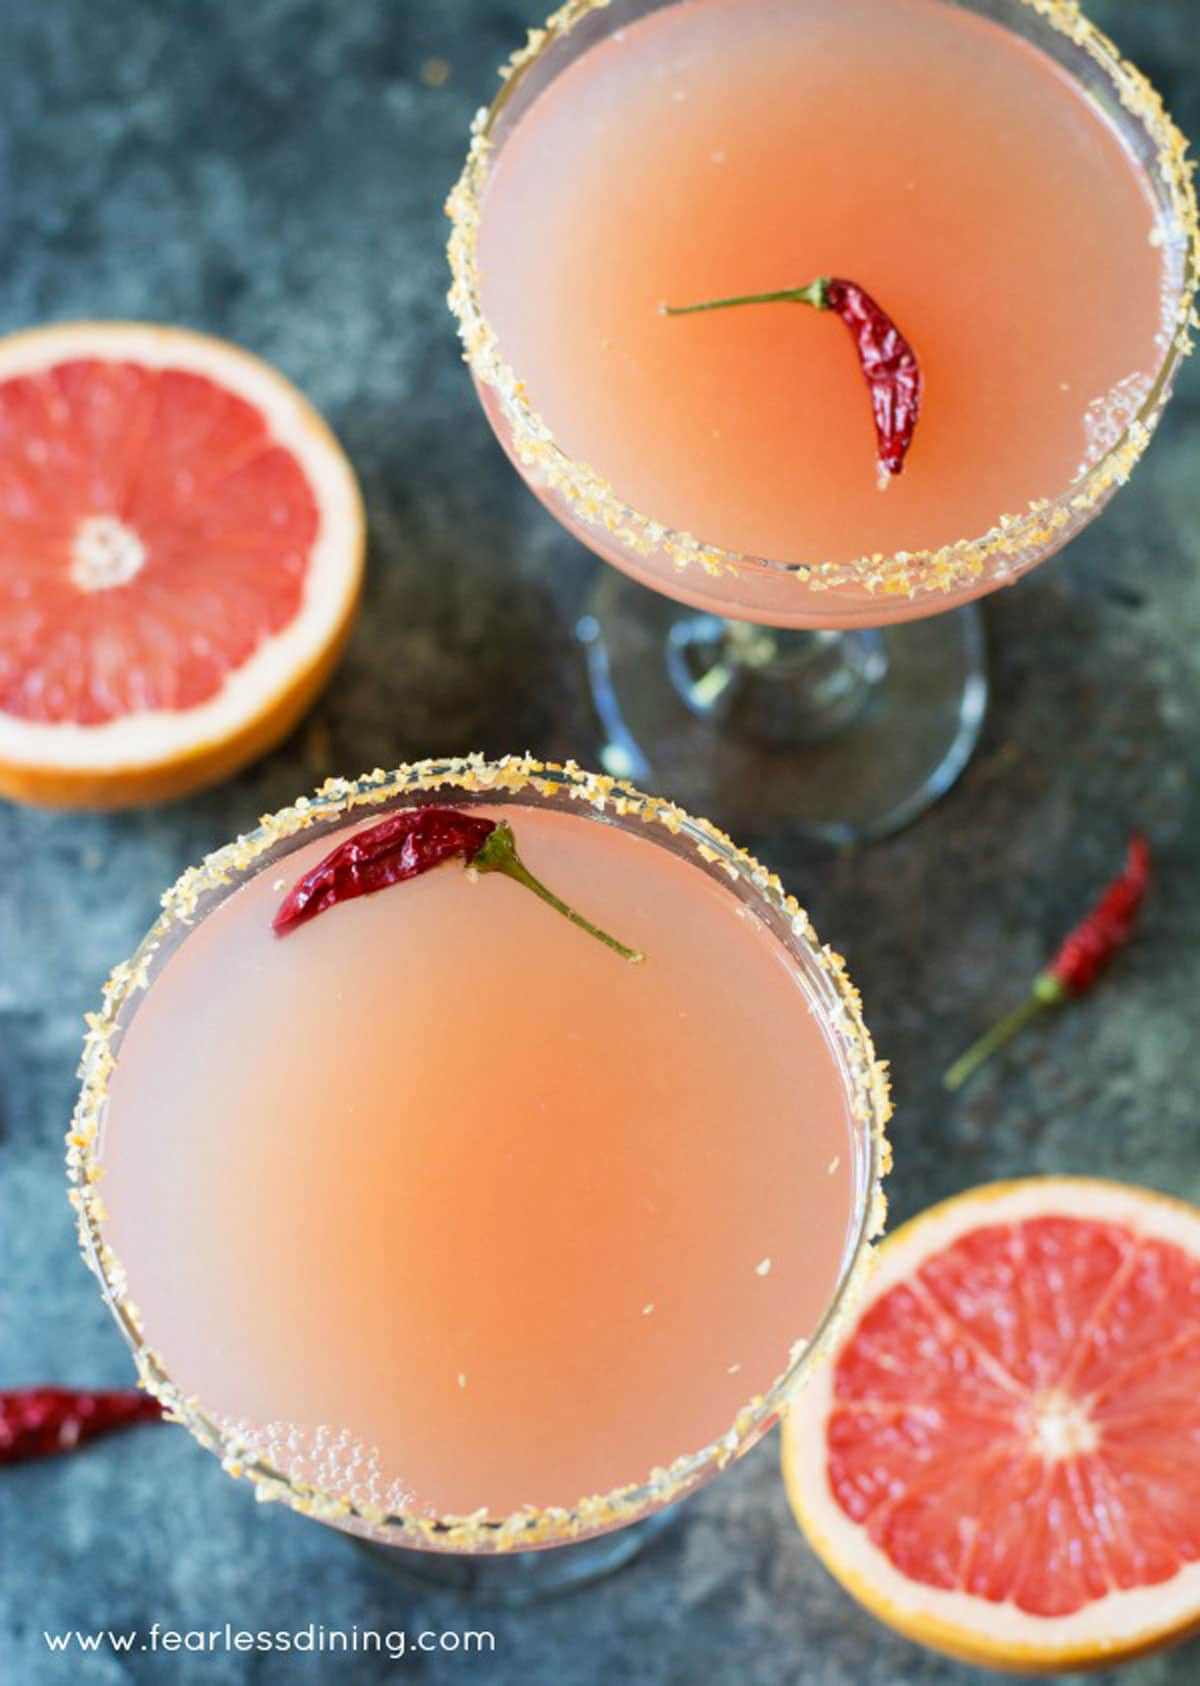 The top view of two pink grapefruit margaritas